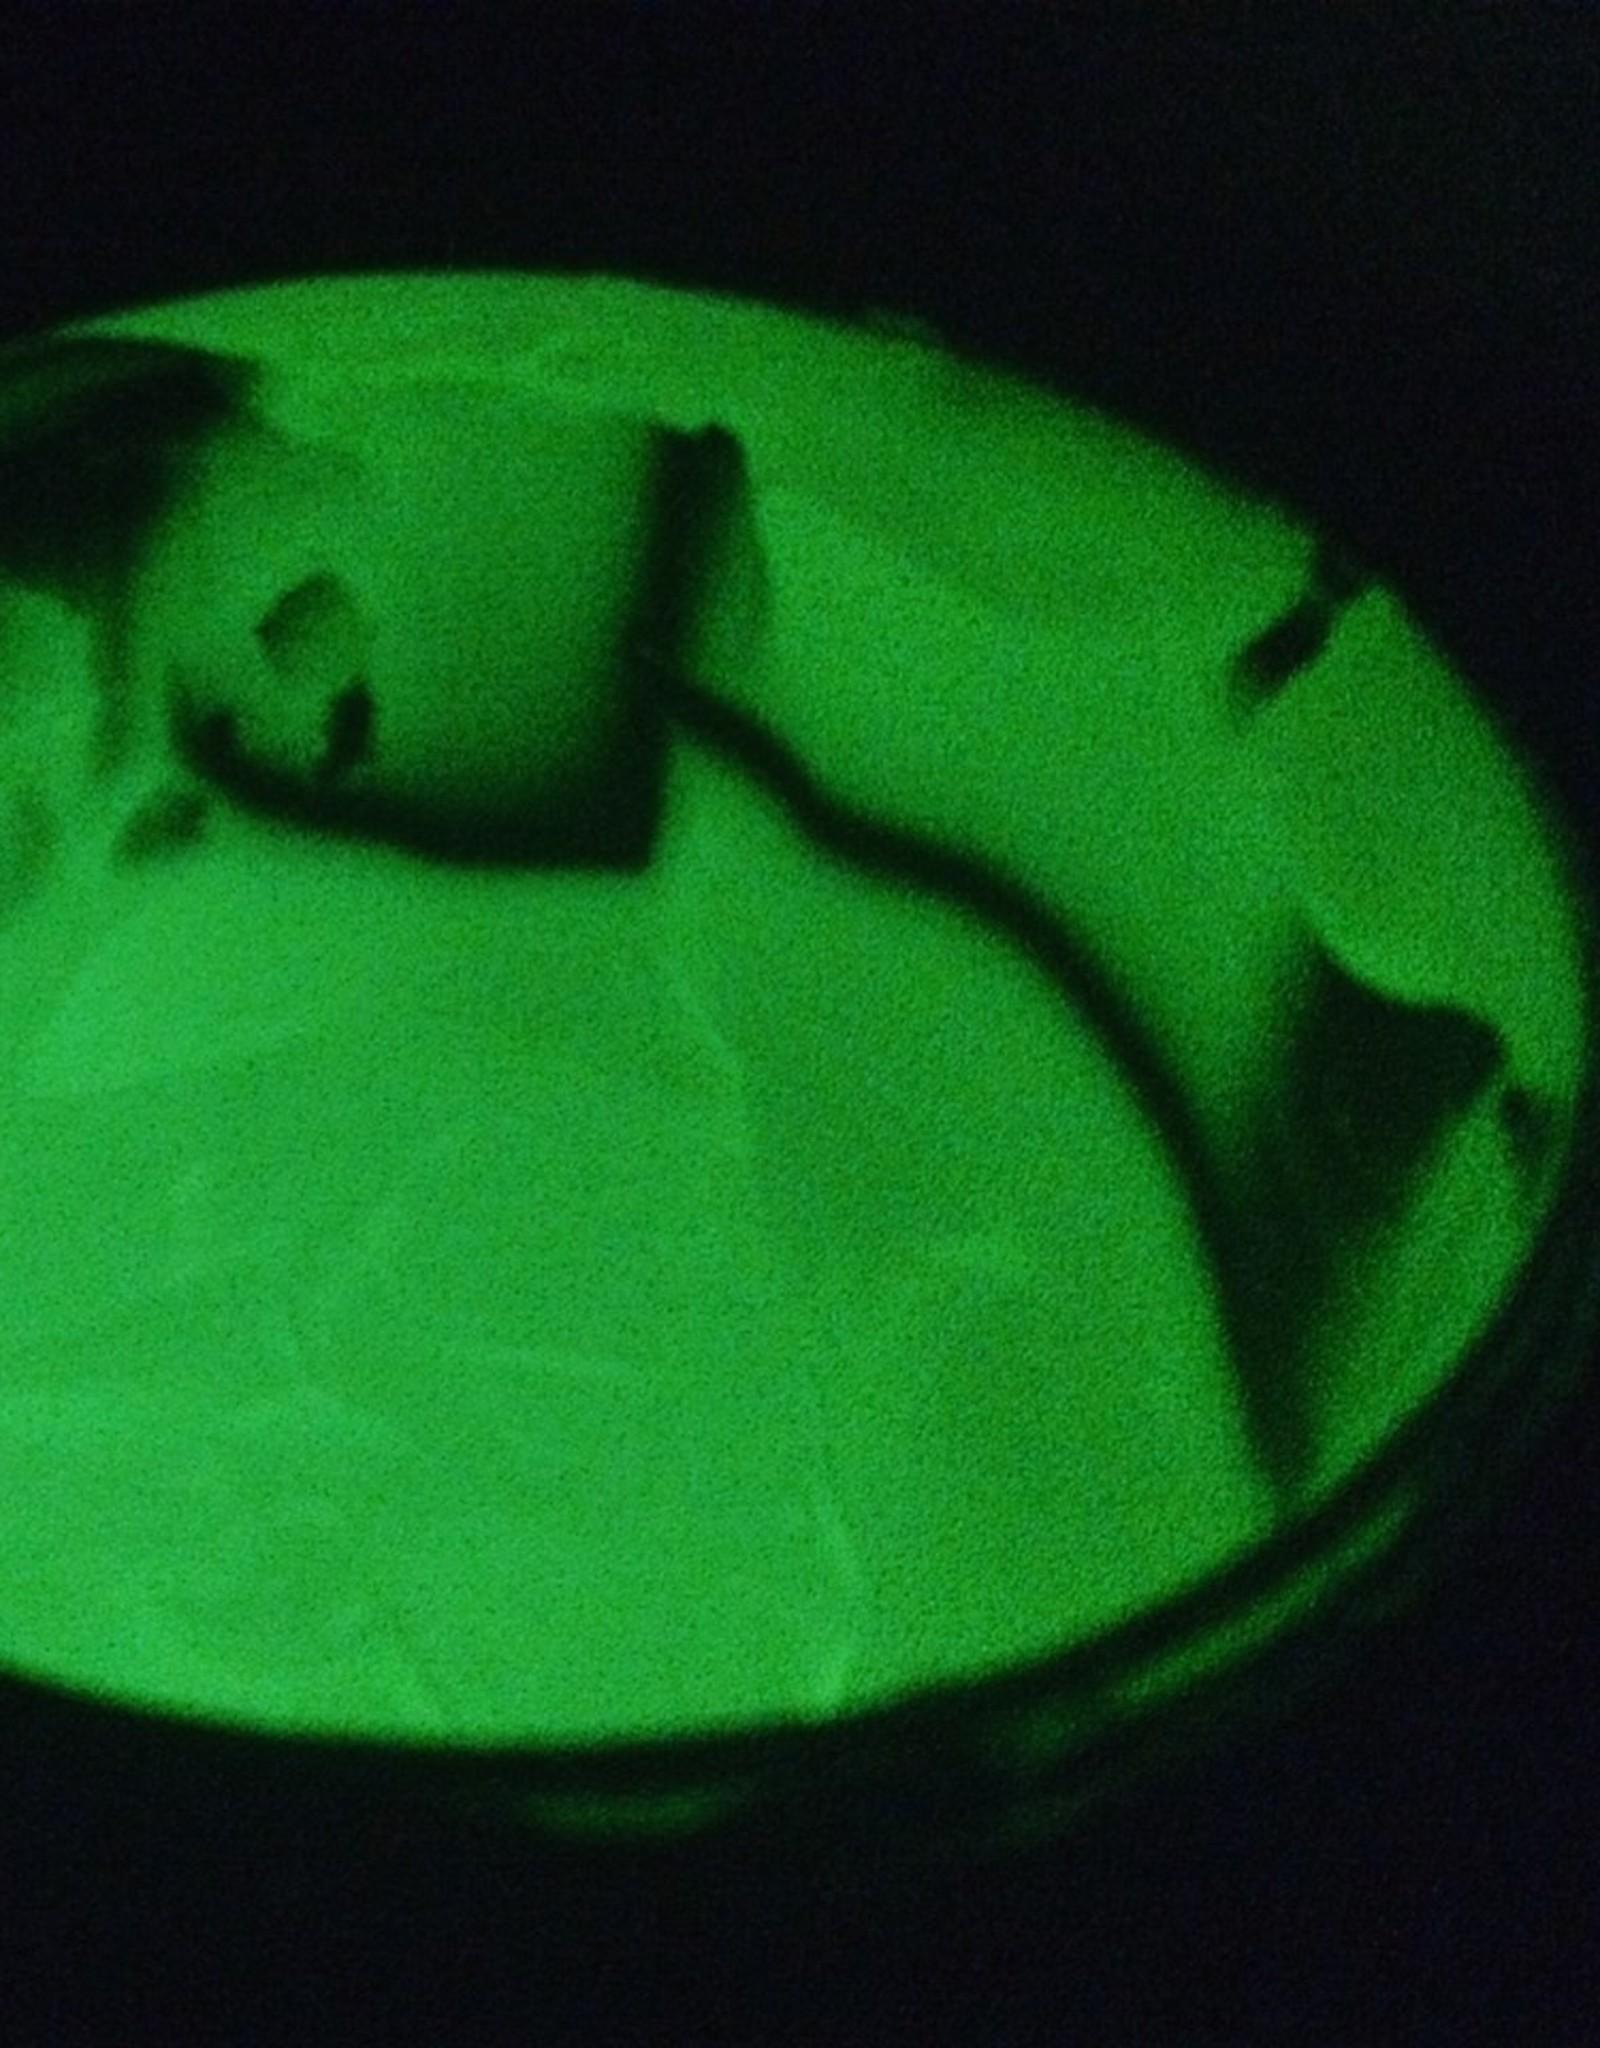 HVK Papierinkt Zeefdruk Glow in the Dark, Geel-Groenig Transparant, 1 Liter